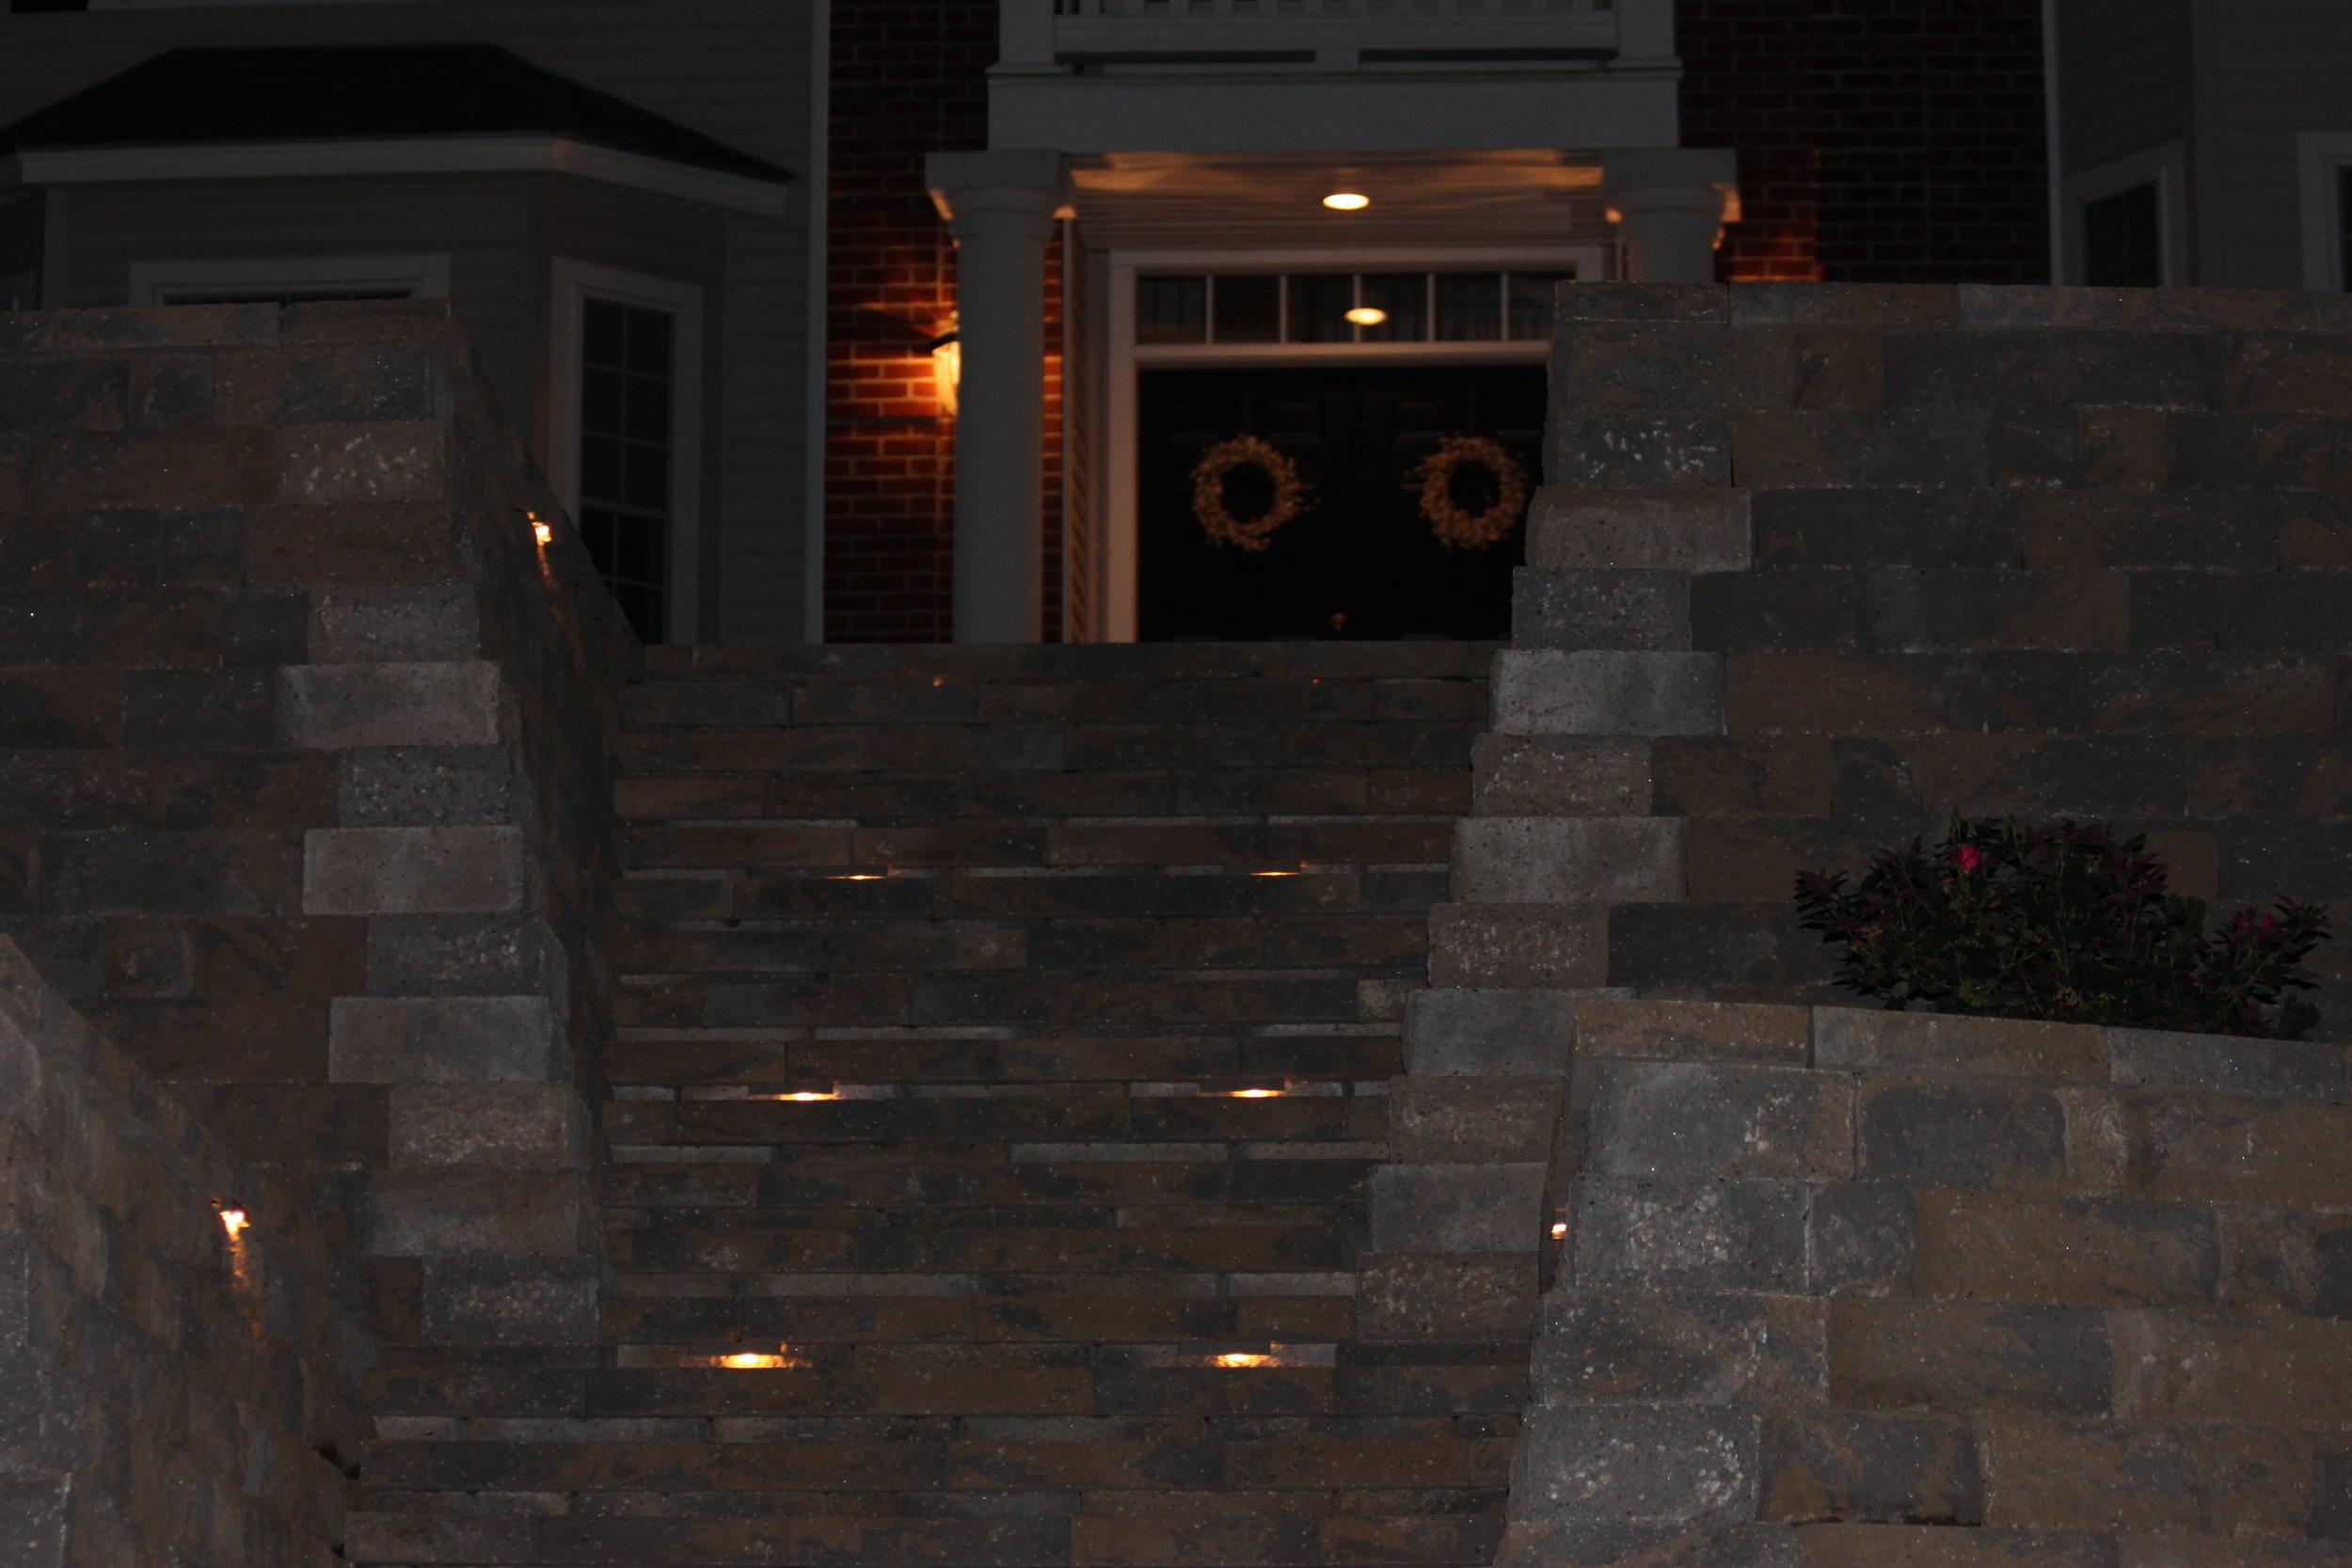 Beautiful landscape design with an outdoor lighting area inHollis, NH